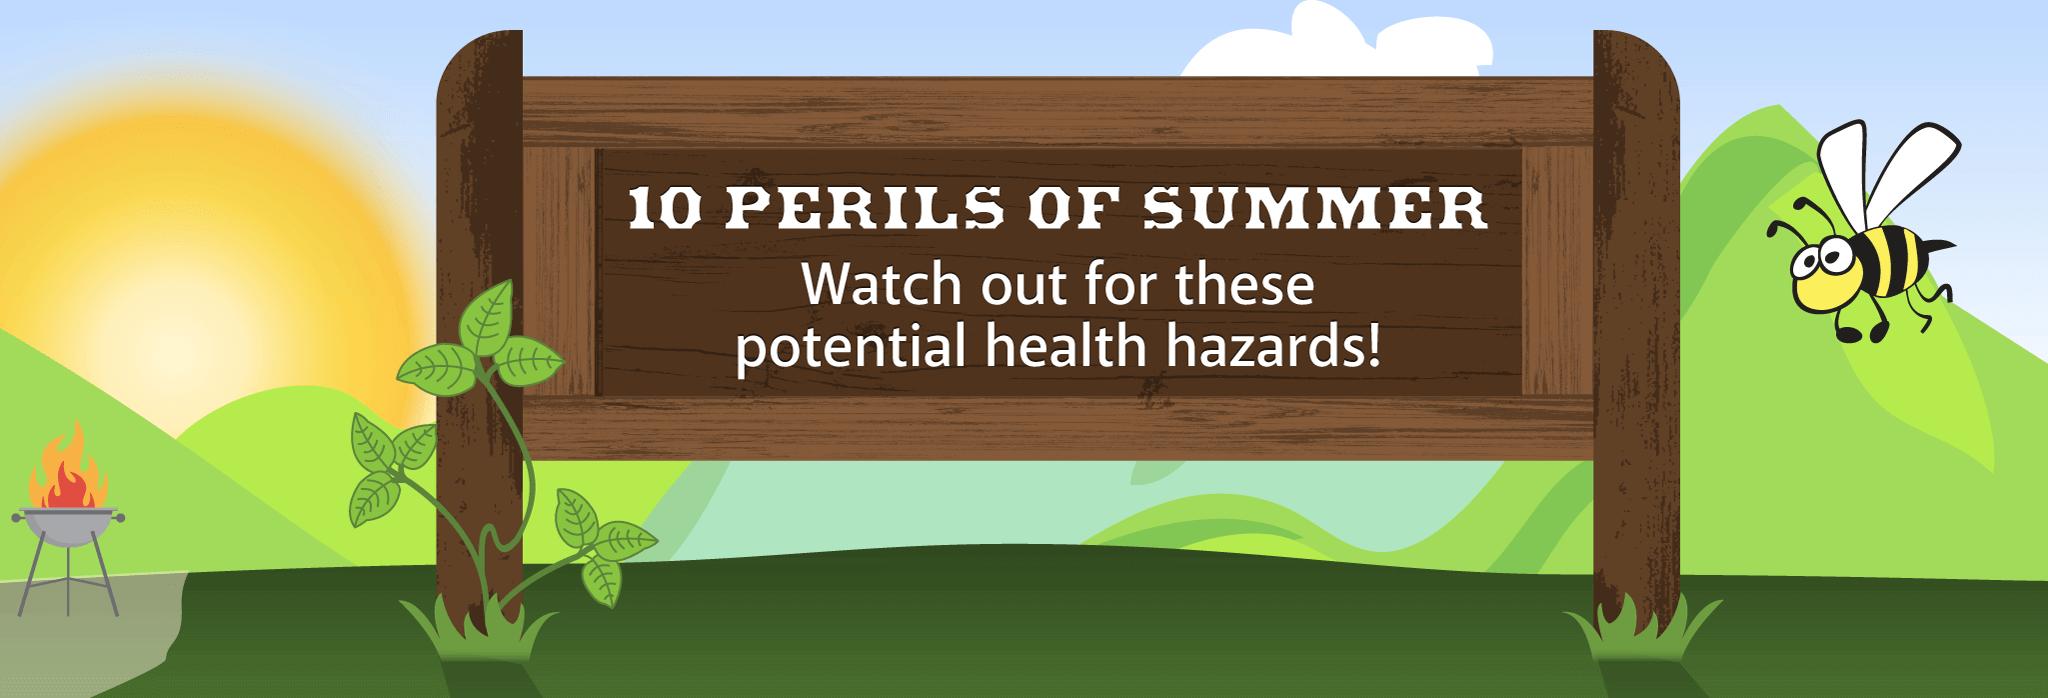 perils-of-summer-top-banner